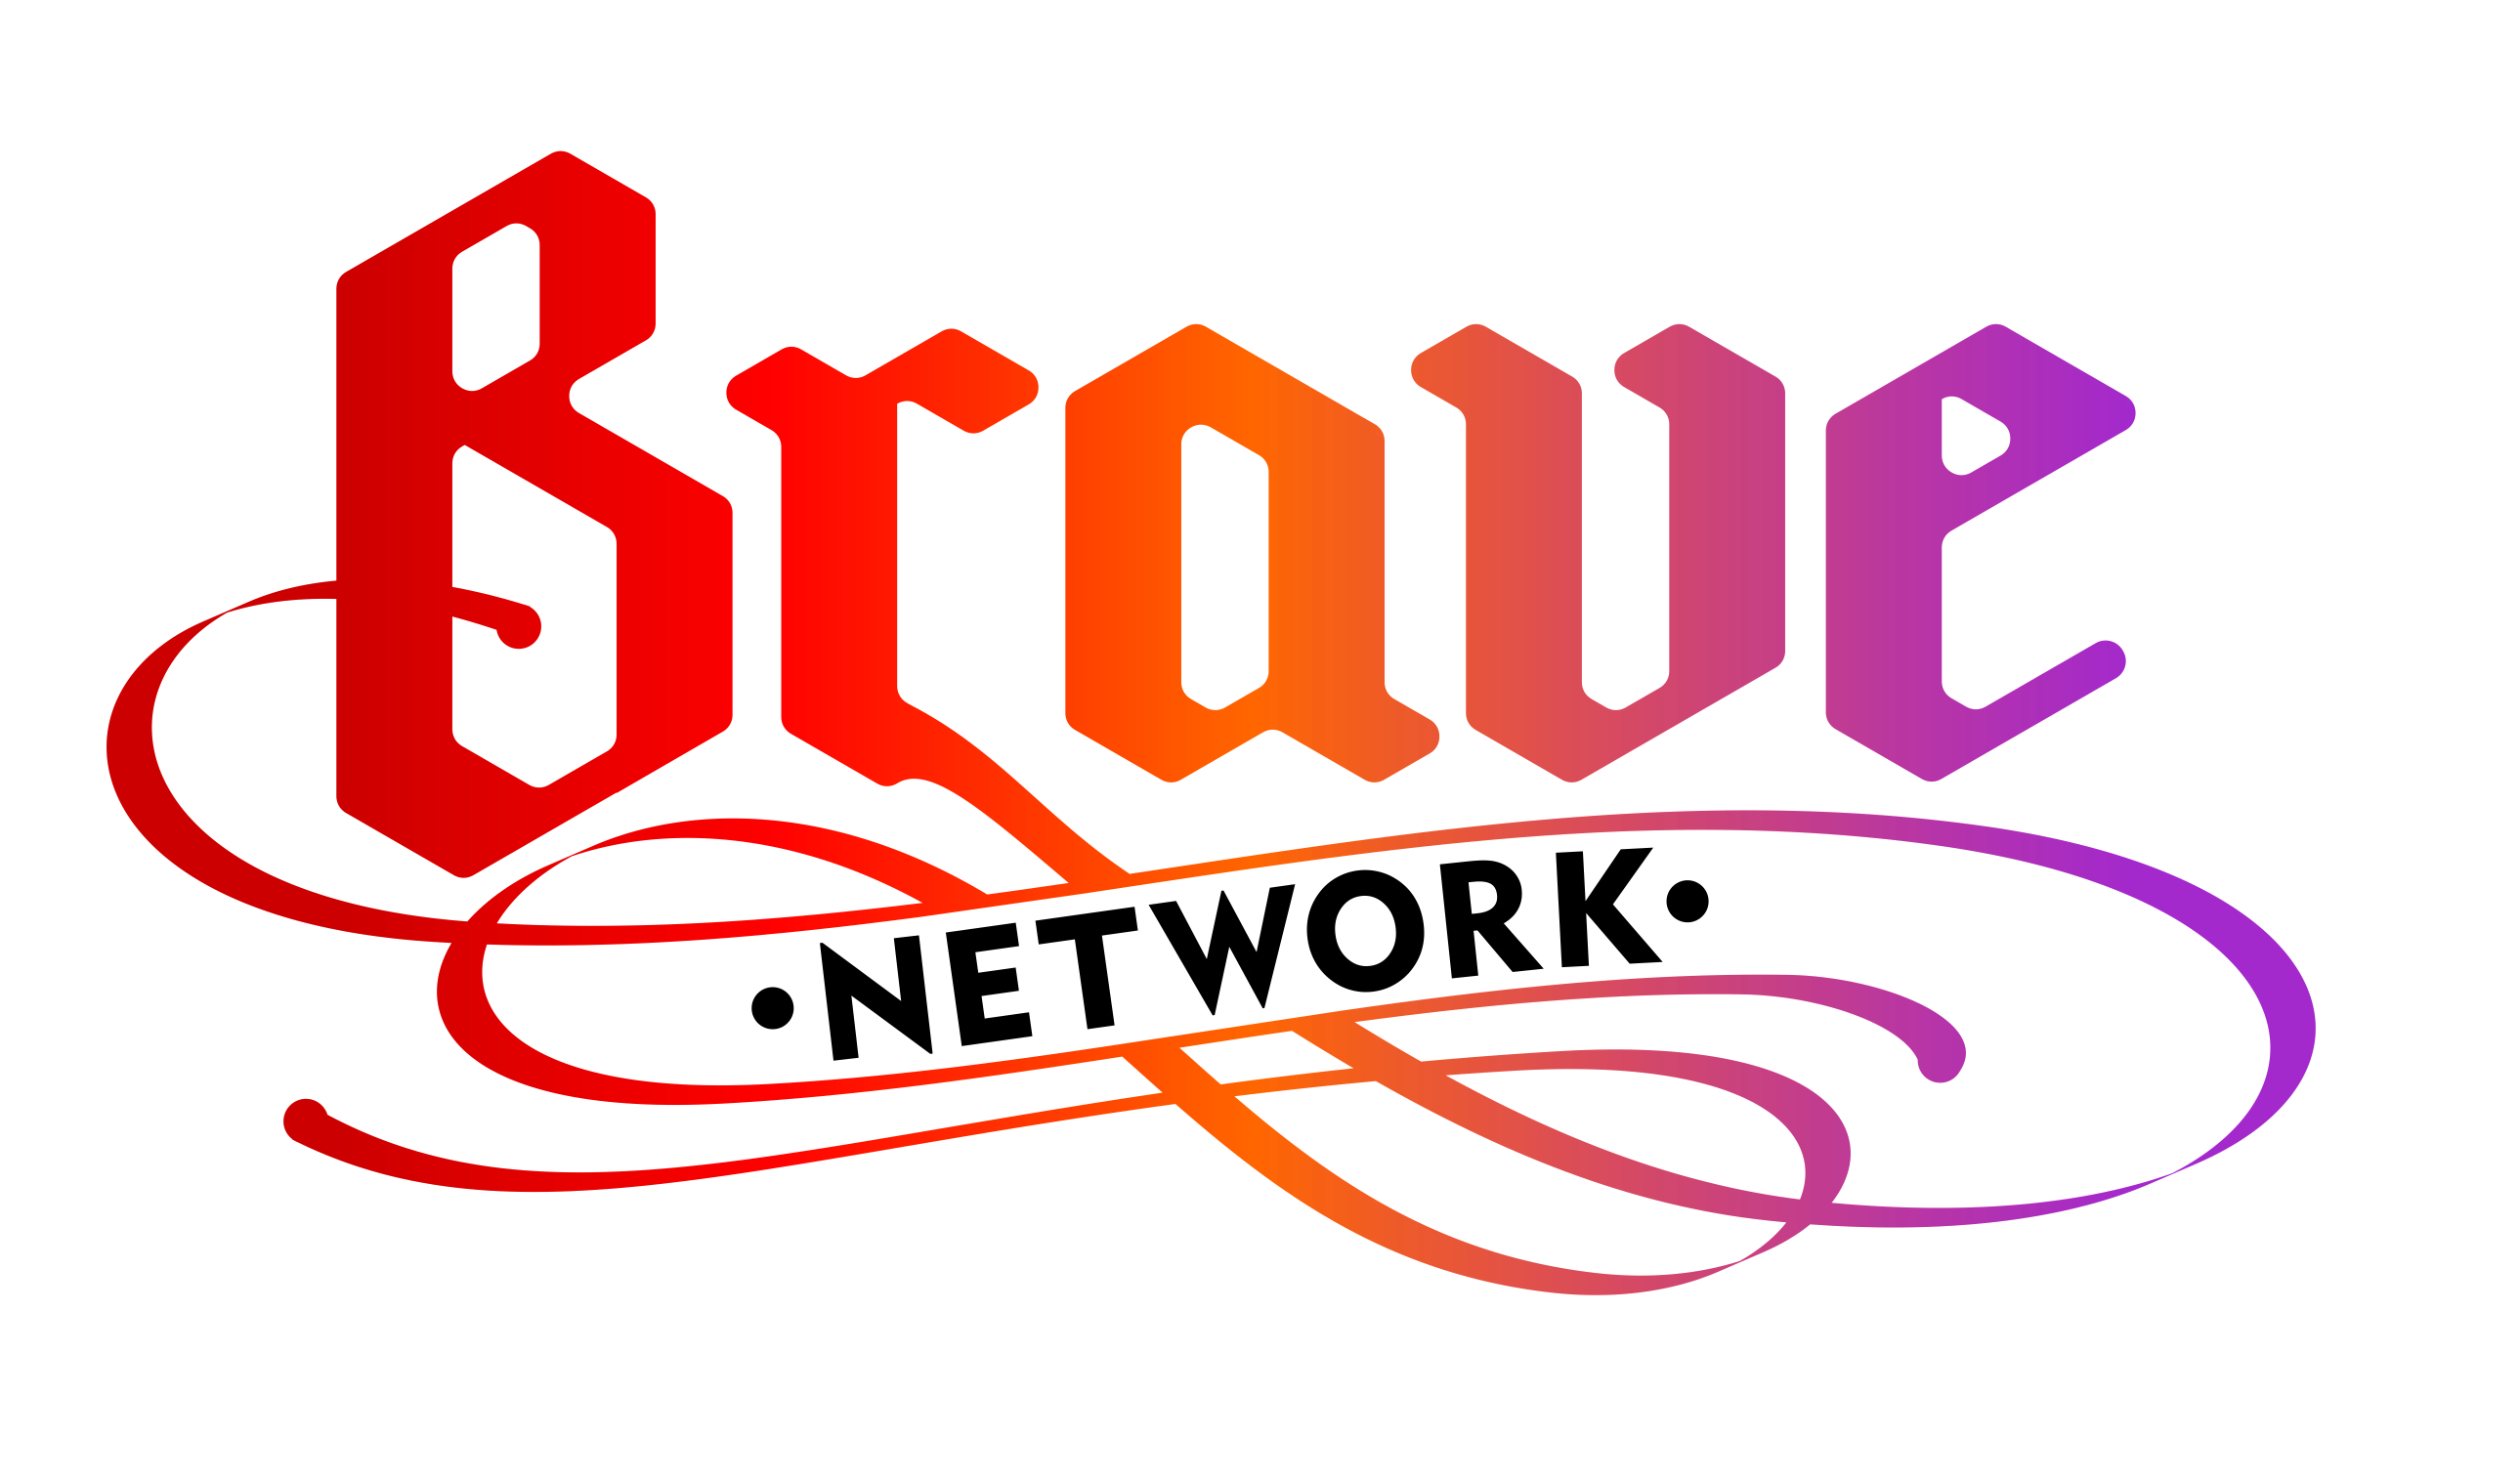 Brave Network